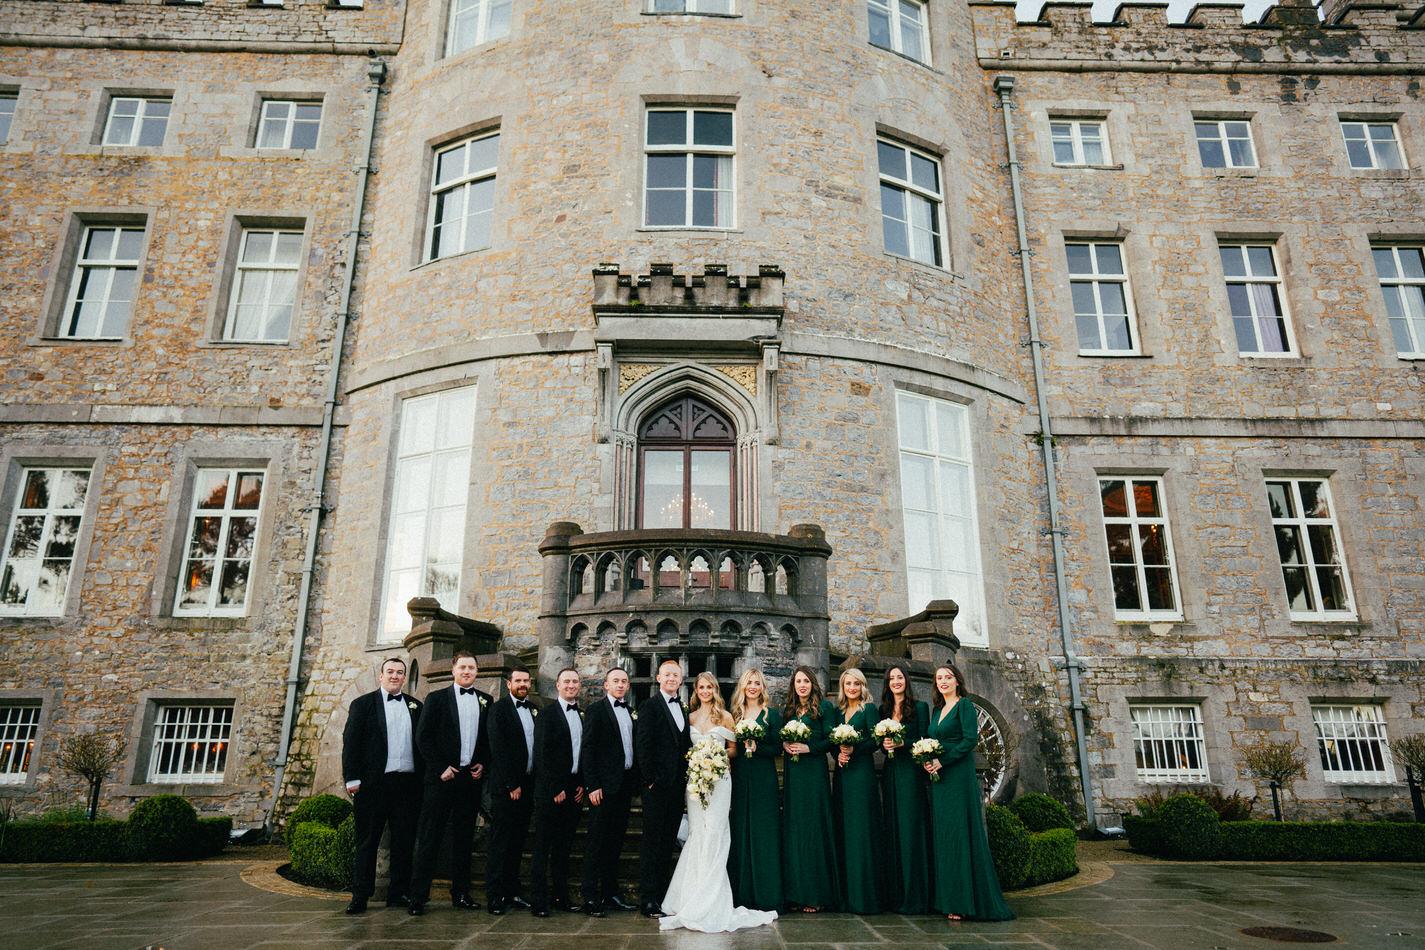 Castle-wedding-ireland-photos- 0215 155